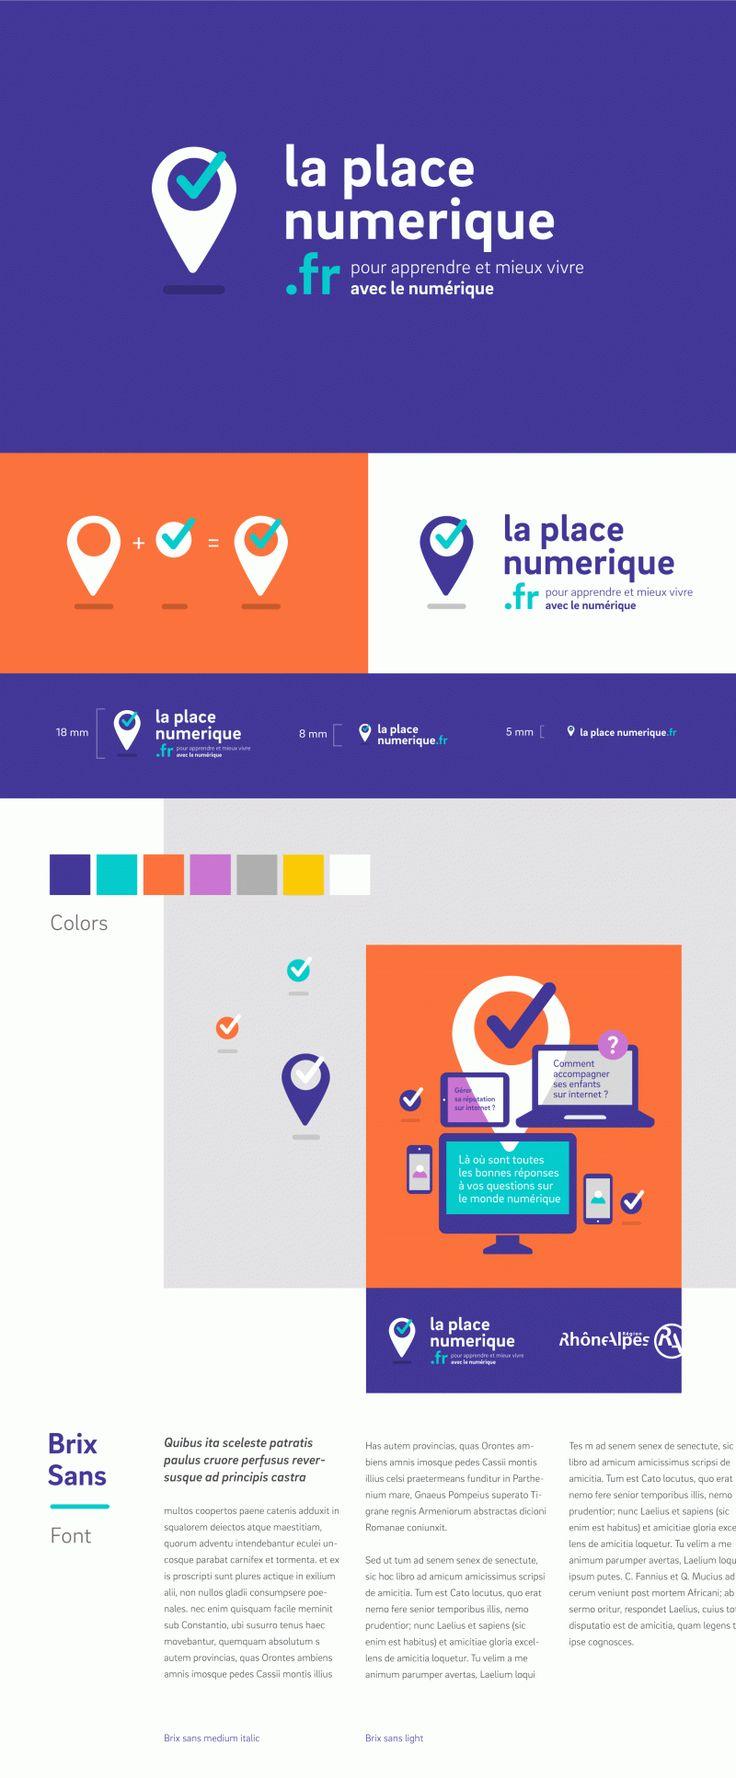 Logo Branding, webdesign minimal flat design laplace-numerique-web  http://www.grapheine.com/portfolio/la-place-numerique